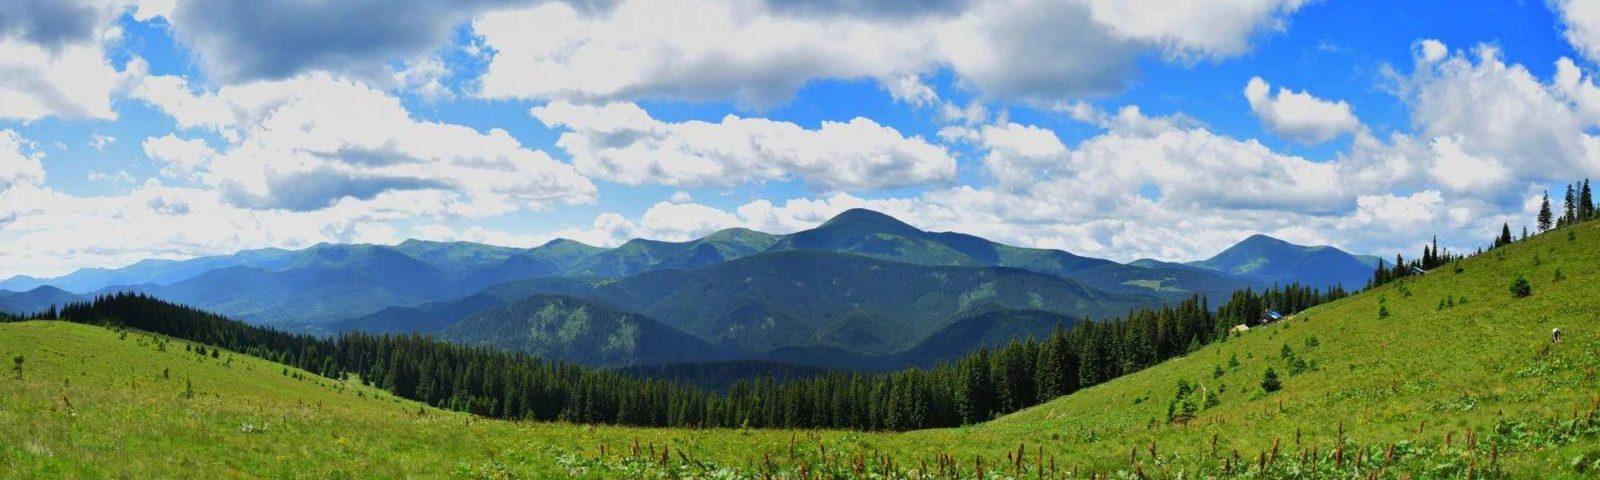 Черногорский хребет маршрут похода